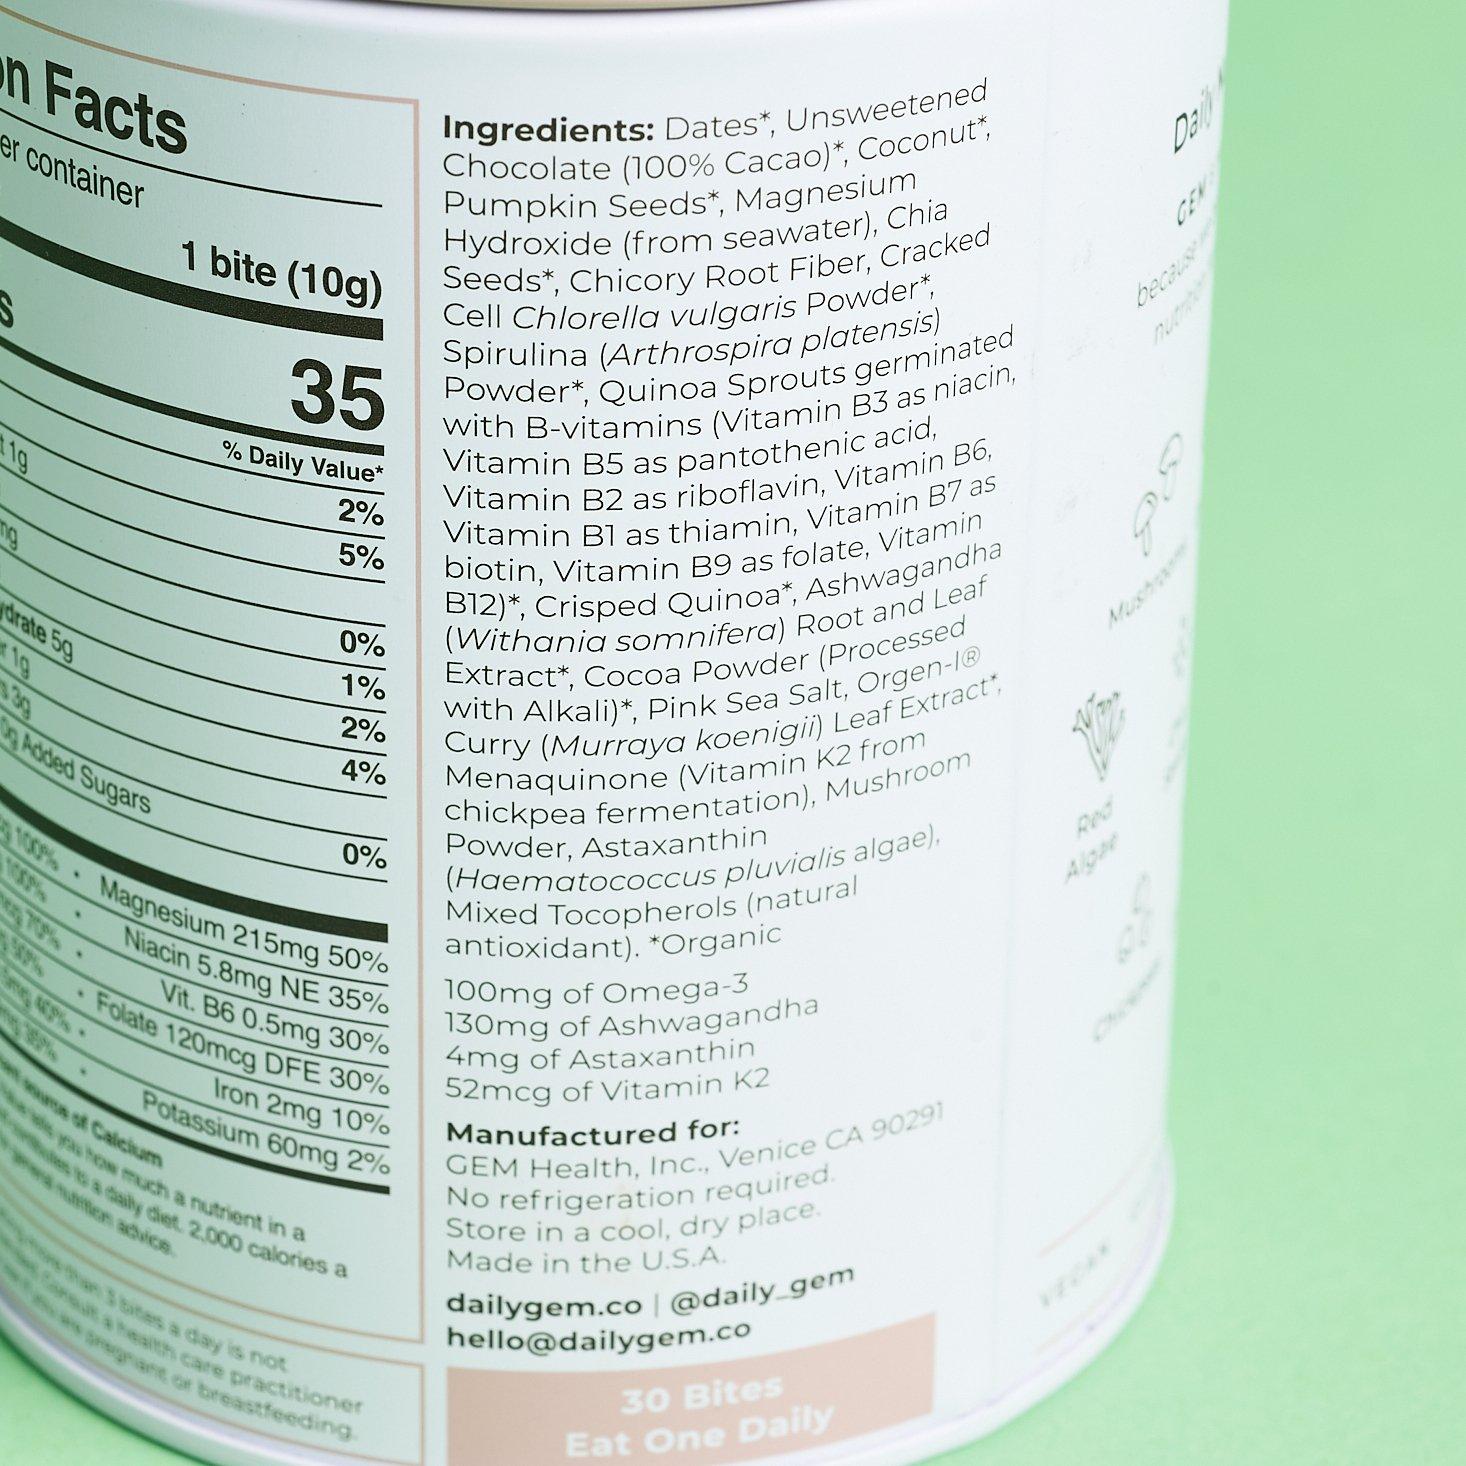 ingredients for GEM on side of canister